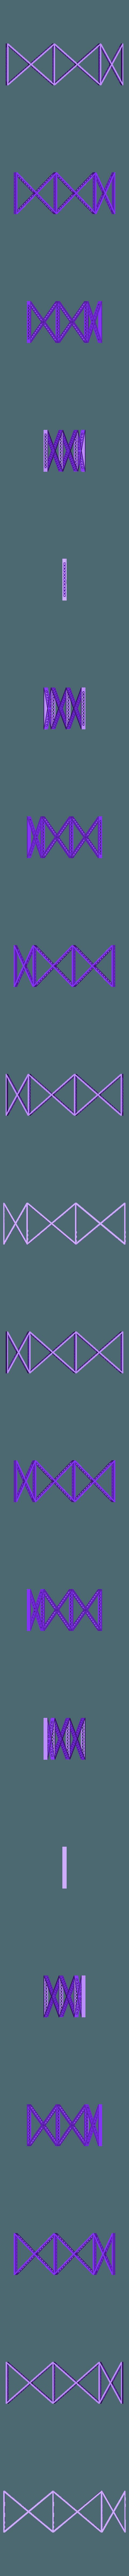 Upper_Trusses.stl Download free STL file HO Scale 145 ft Steel Arched Truss Bridge • 3D printer model, kabrumble